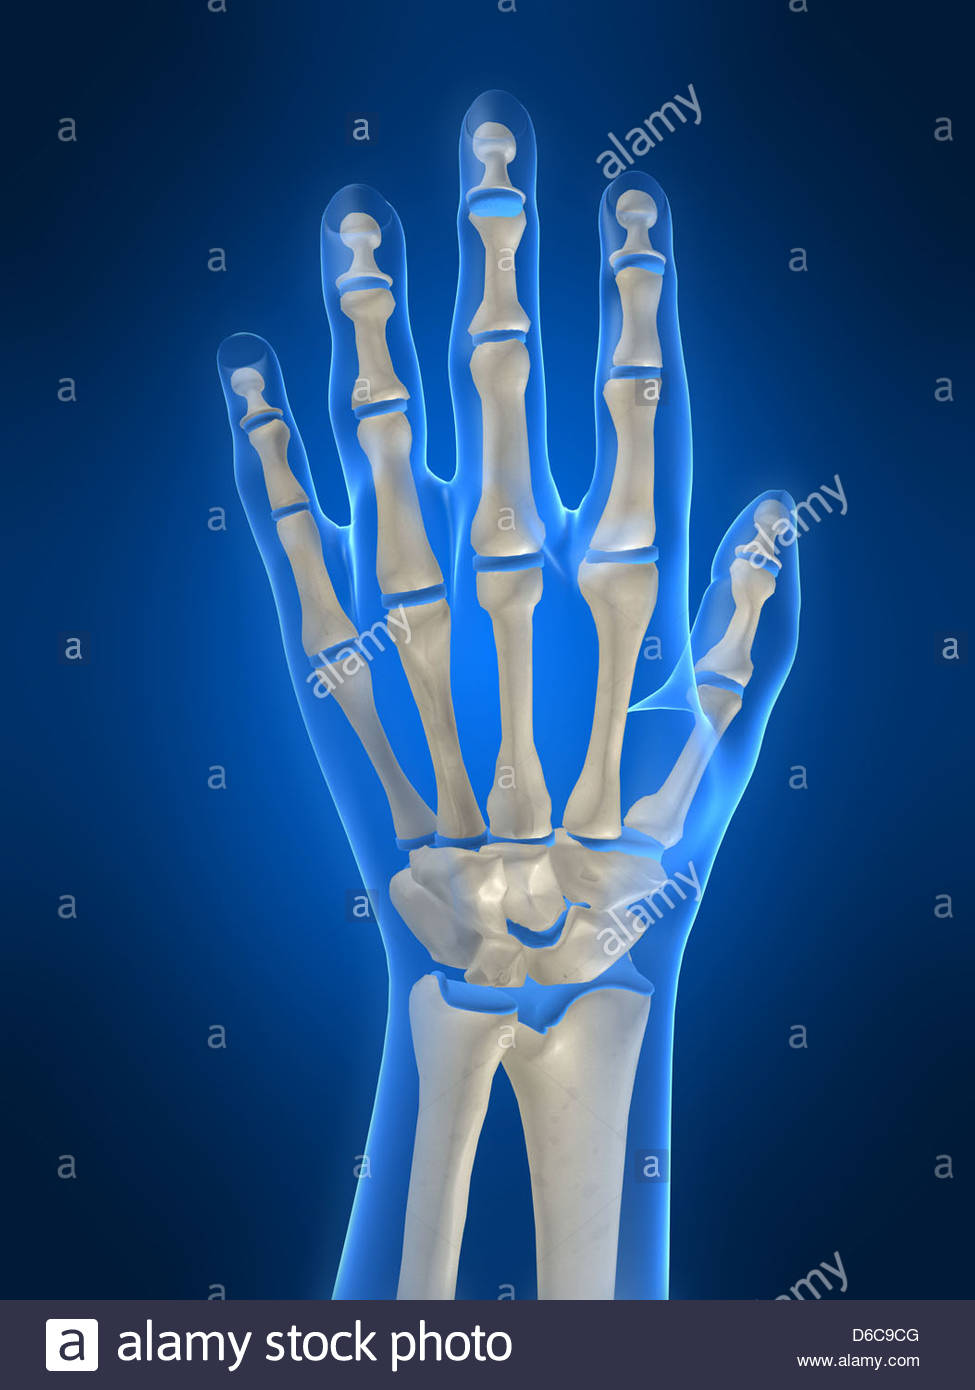 finger,hand,skeleton,medical illustrations - Stock Image